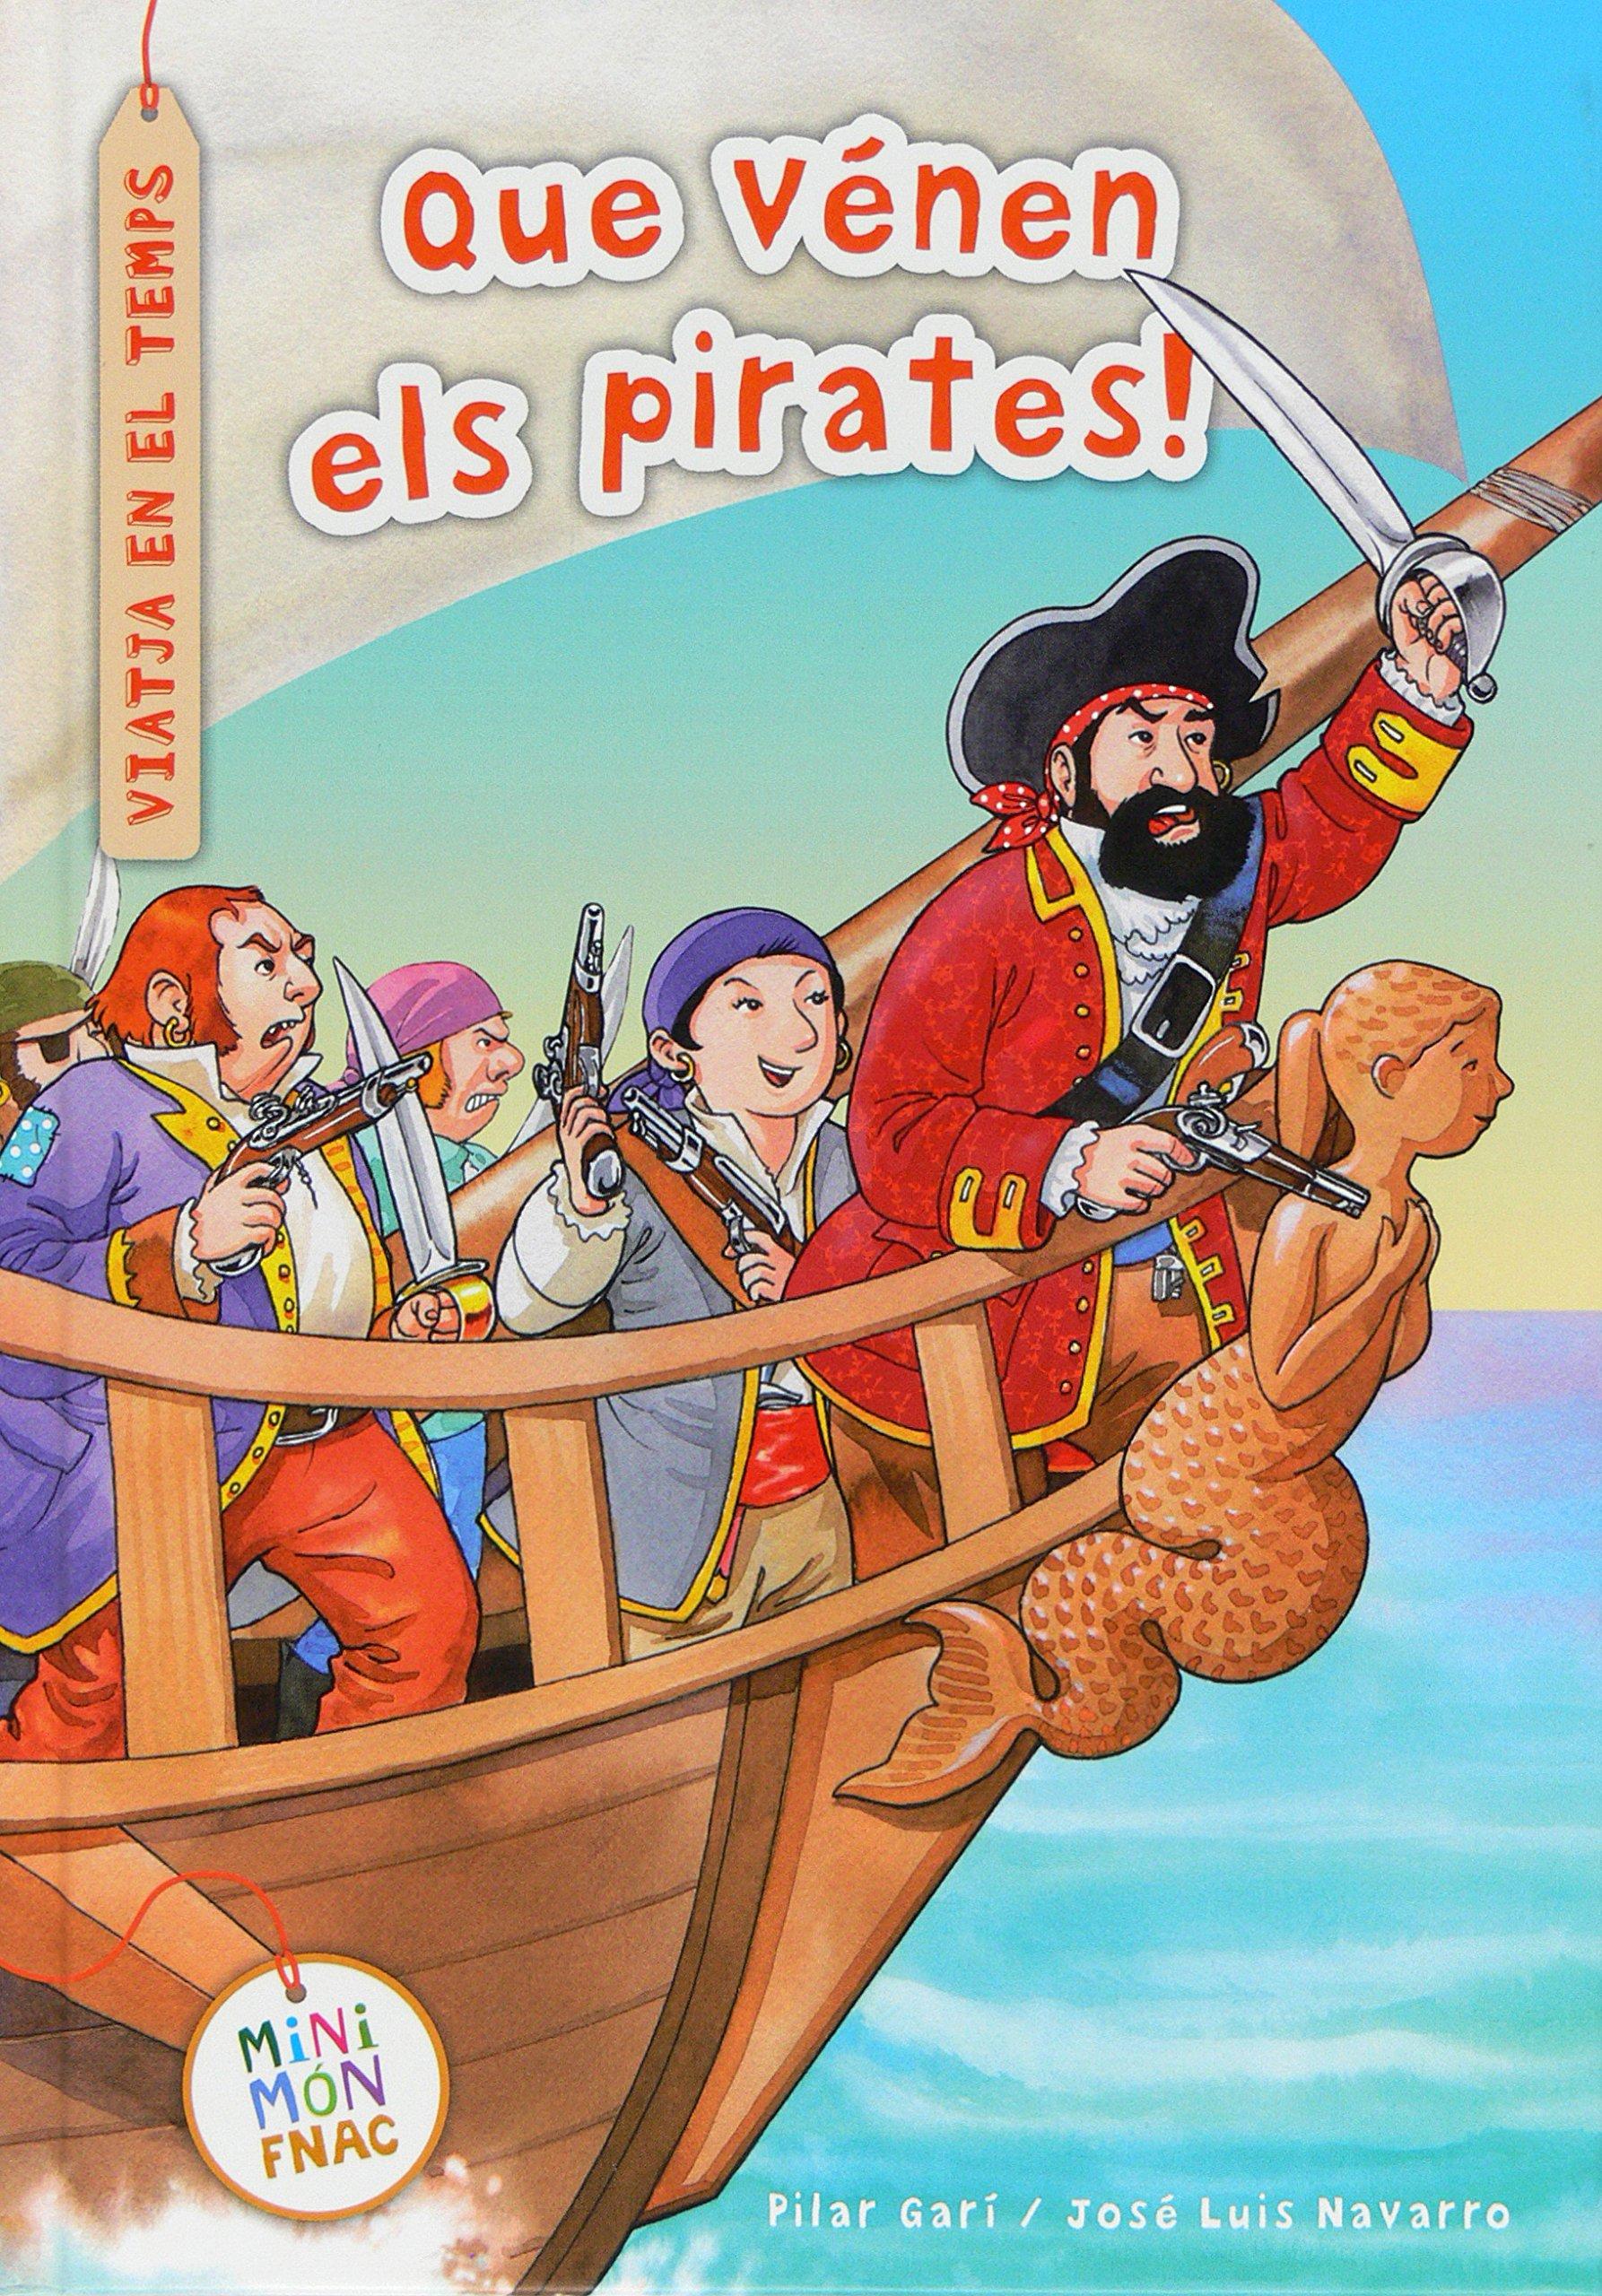 Que vénen els pirates! (Mini Mundo Fnac): Amazon.es: Pilar Garí de Aguilera, José Luis Navarro García: Libros